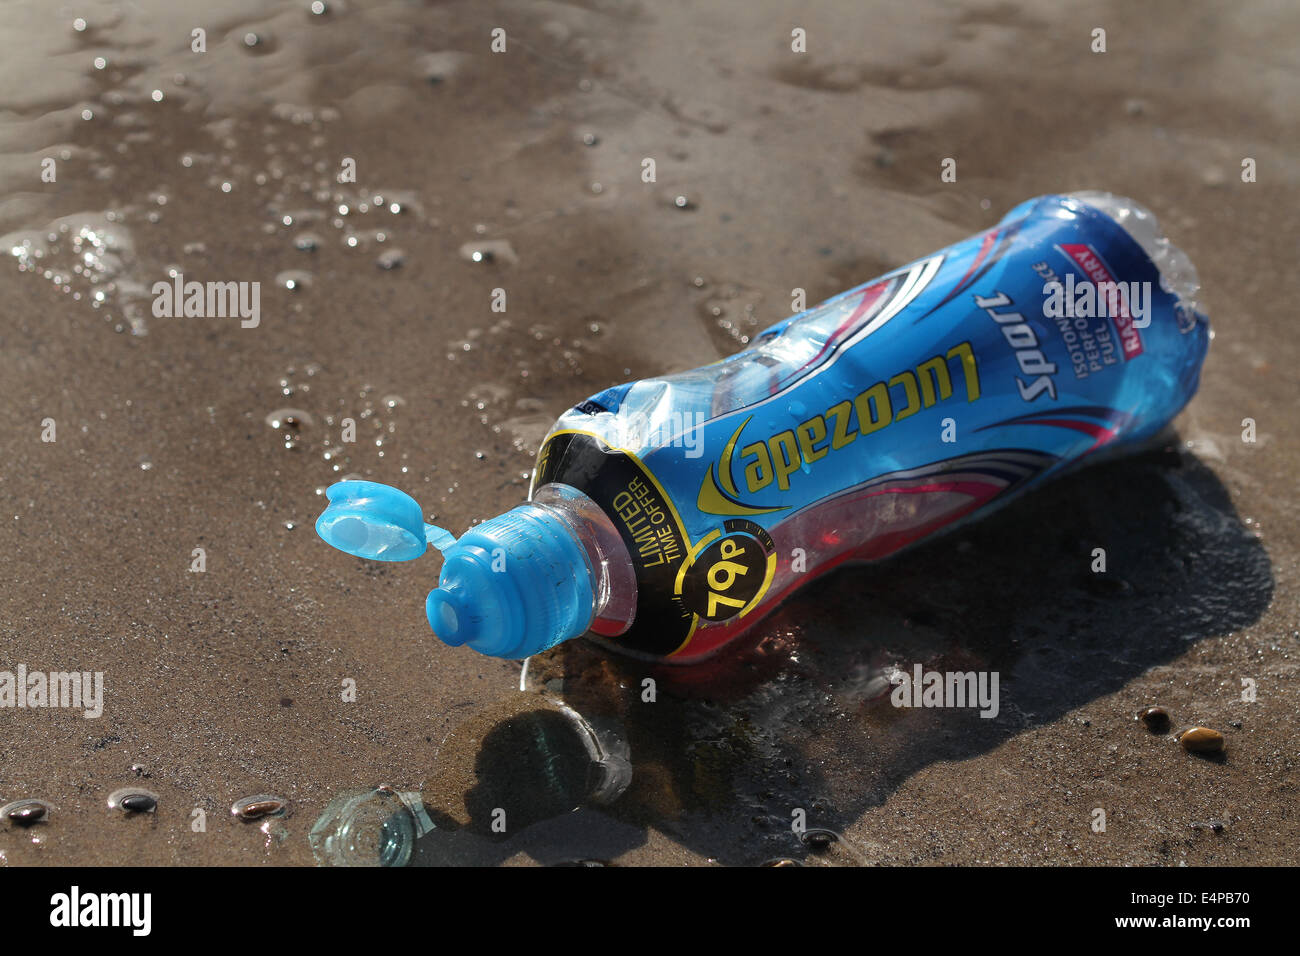 Plastic drinks bottle discarded on beach. - Stock Image